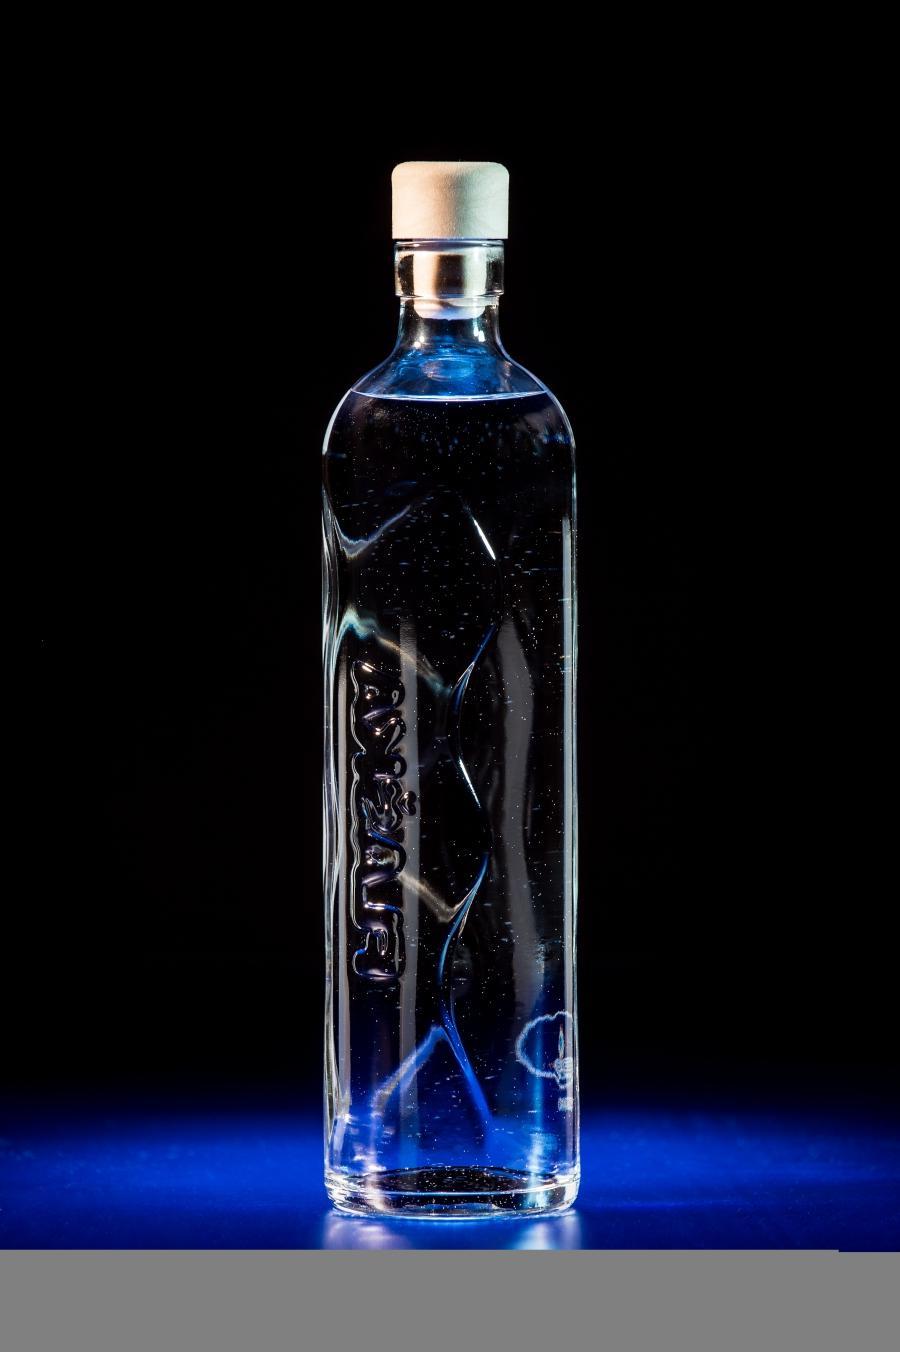 Photos Of Glass Bottles